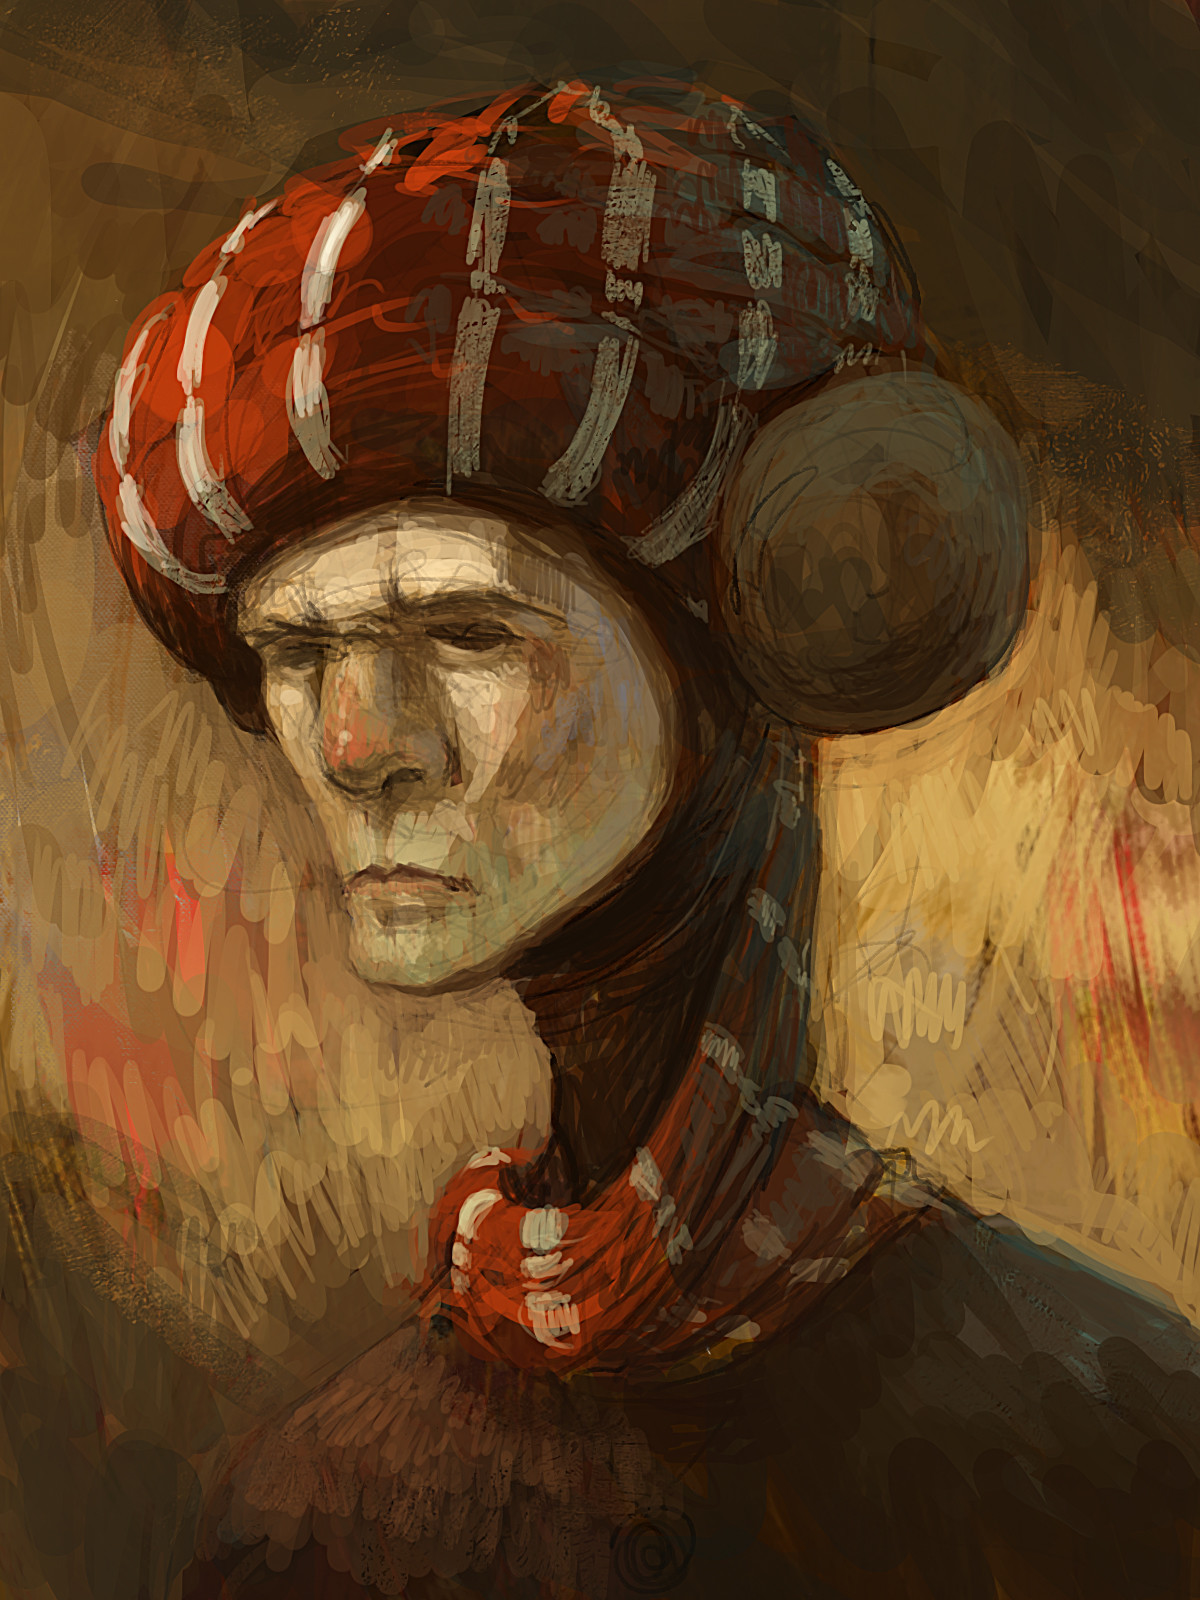 Imx awan sketching character